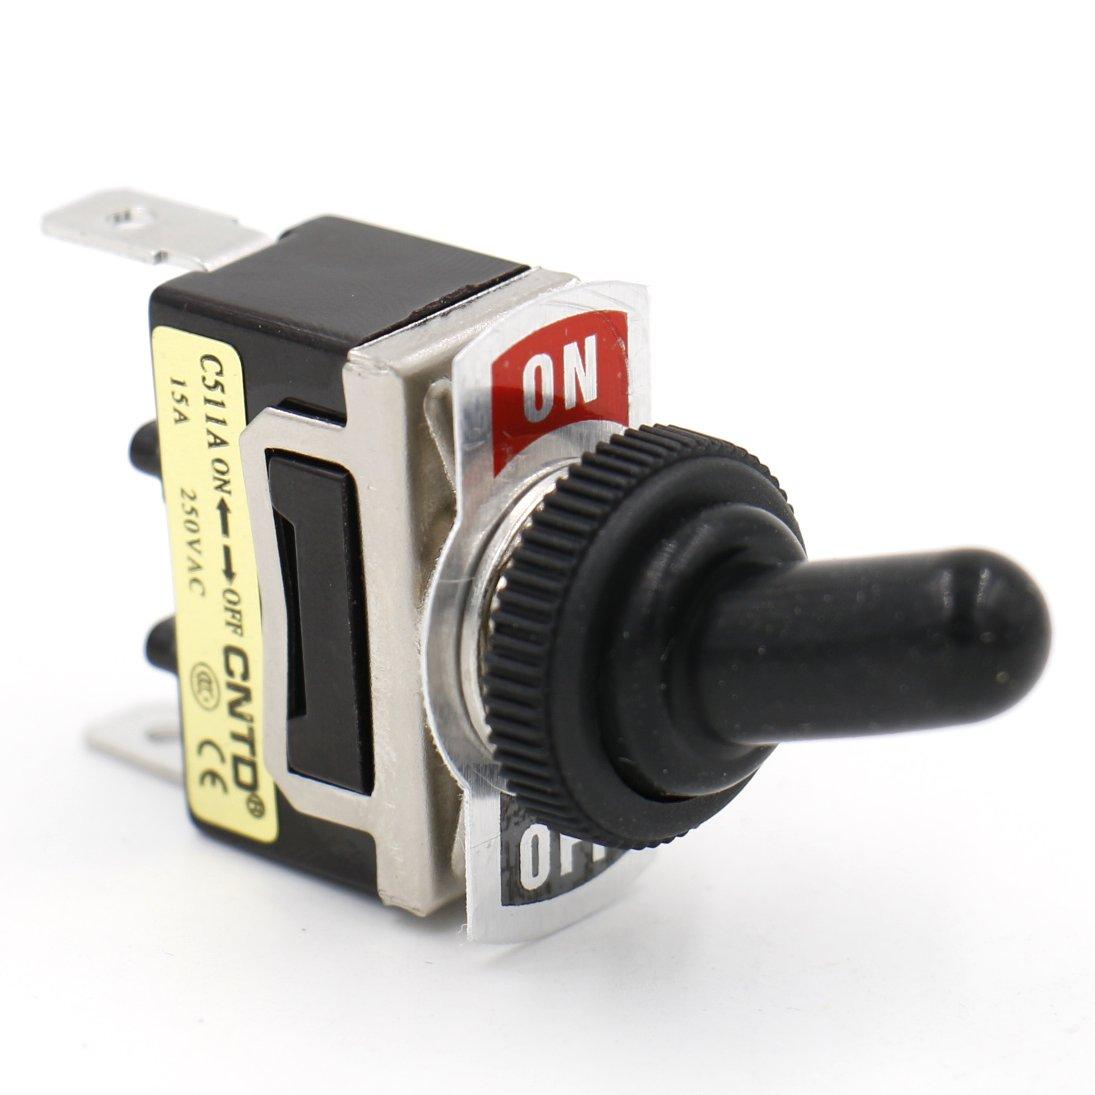 heschen Metal Toggle Interruptor SPST mantiene ON//OFF 2/Posici/ón 15/A 250/VAC 2/Tab Terminal CE con funda impermeable